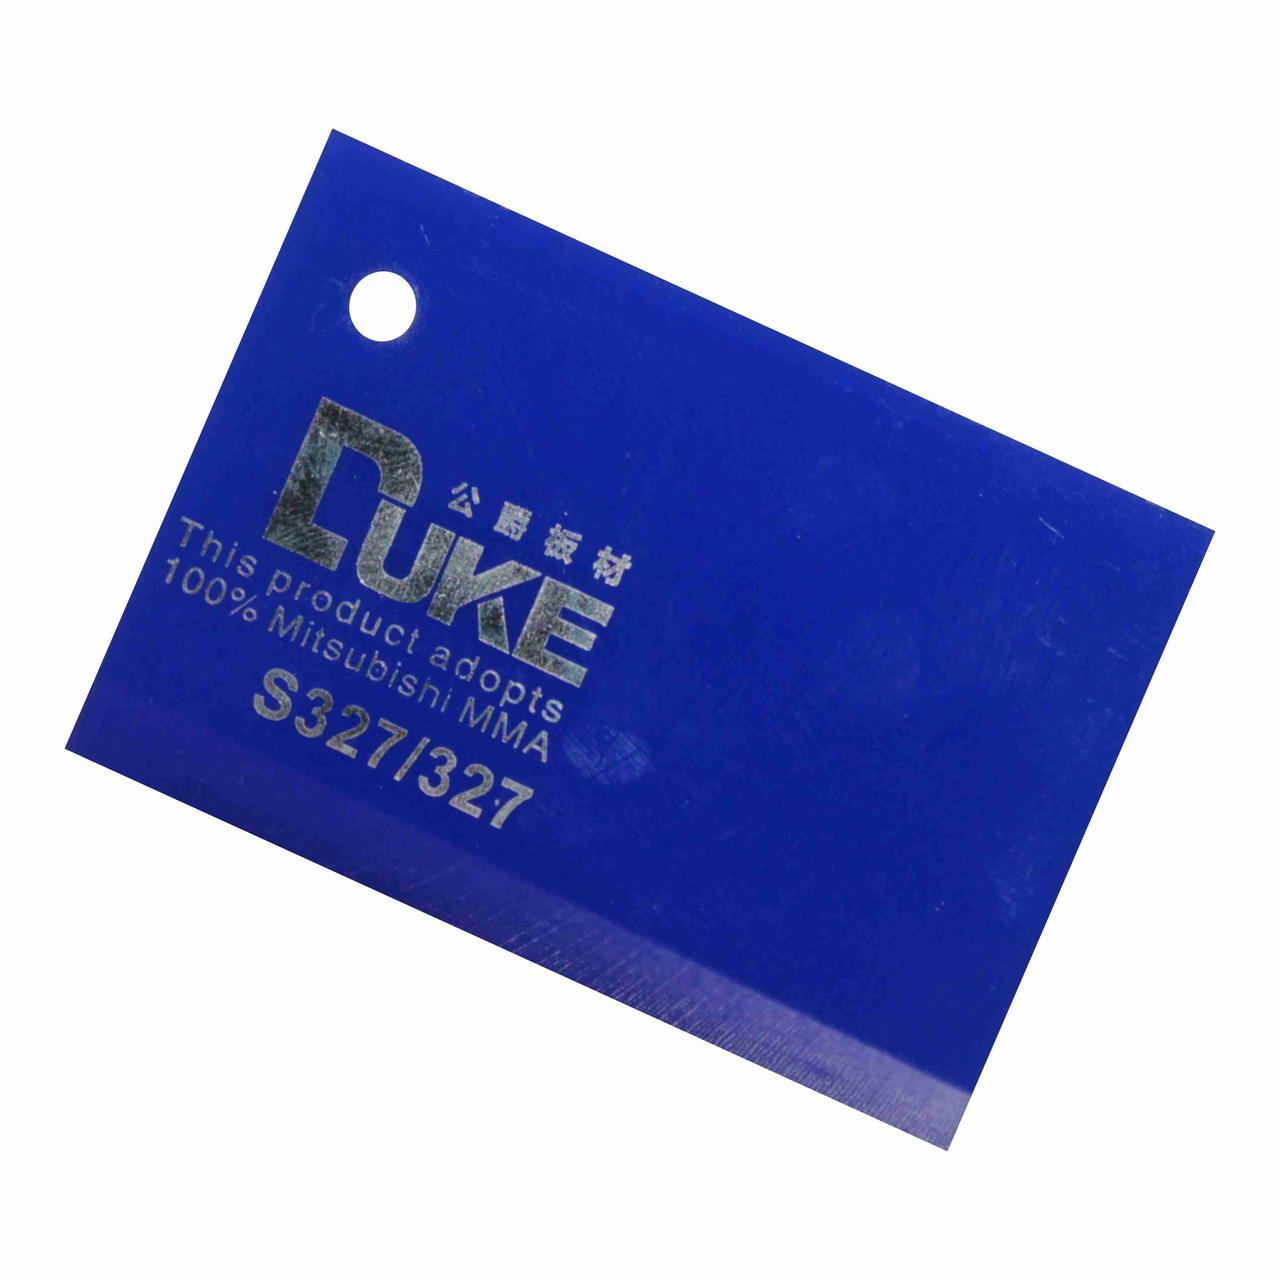 Акрил темно синий №327 (3мм) 1,22мХ2,44м